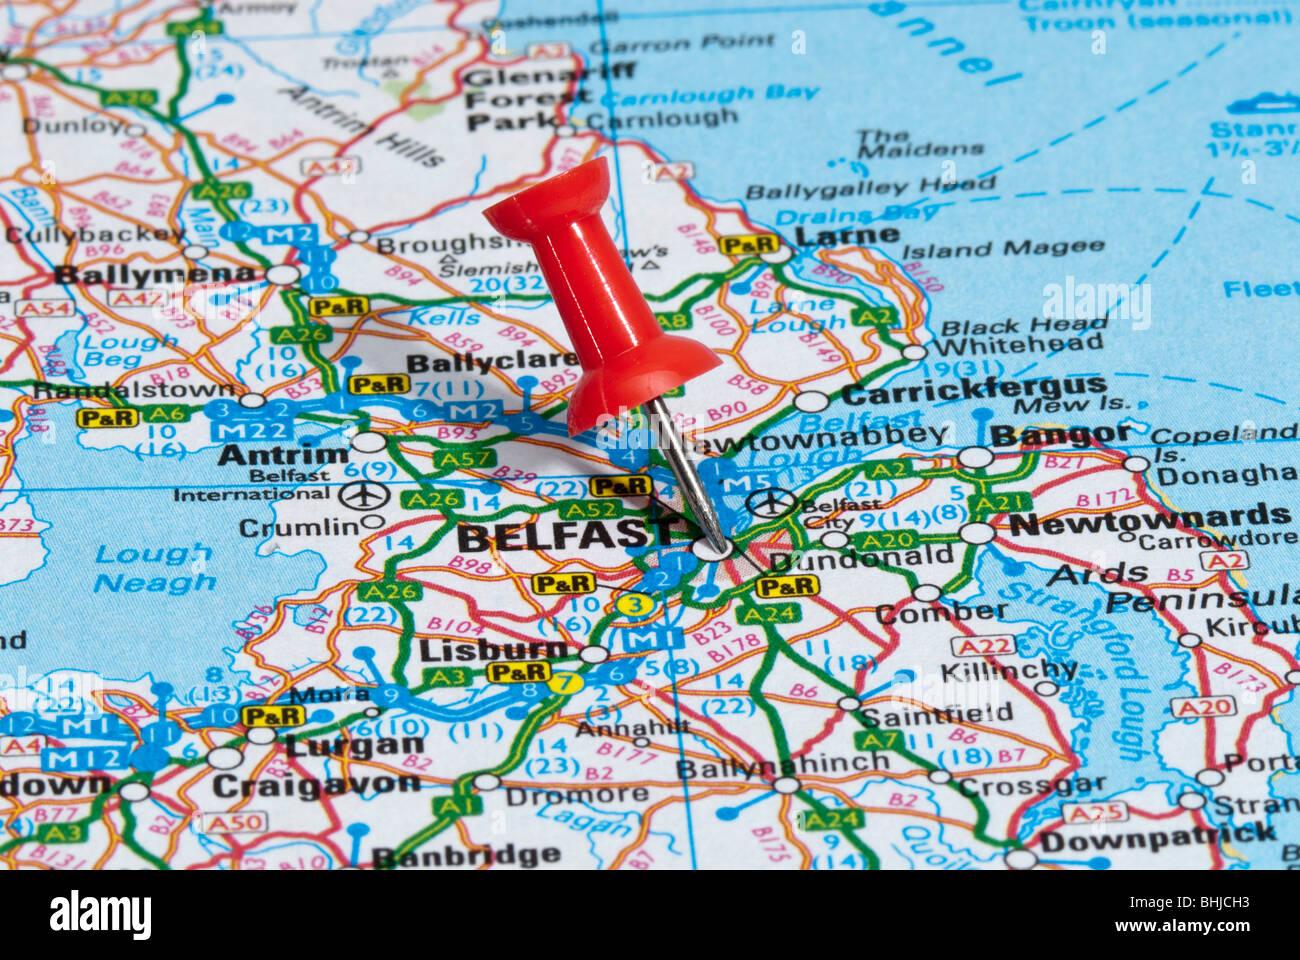 Belfast Northern Ireland Location Map Stockfotos & Belfast ...